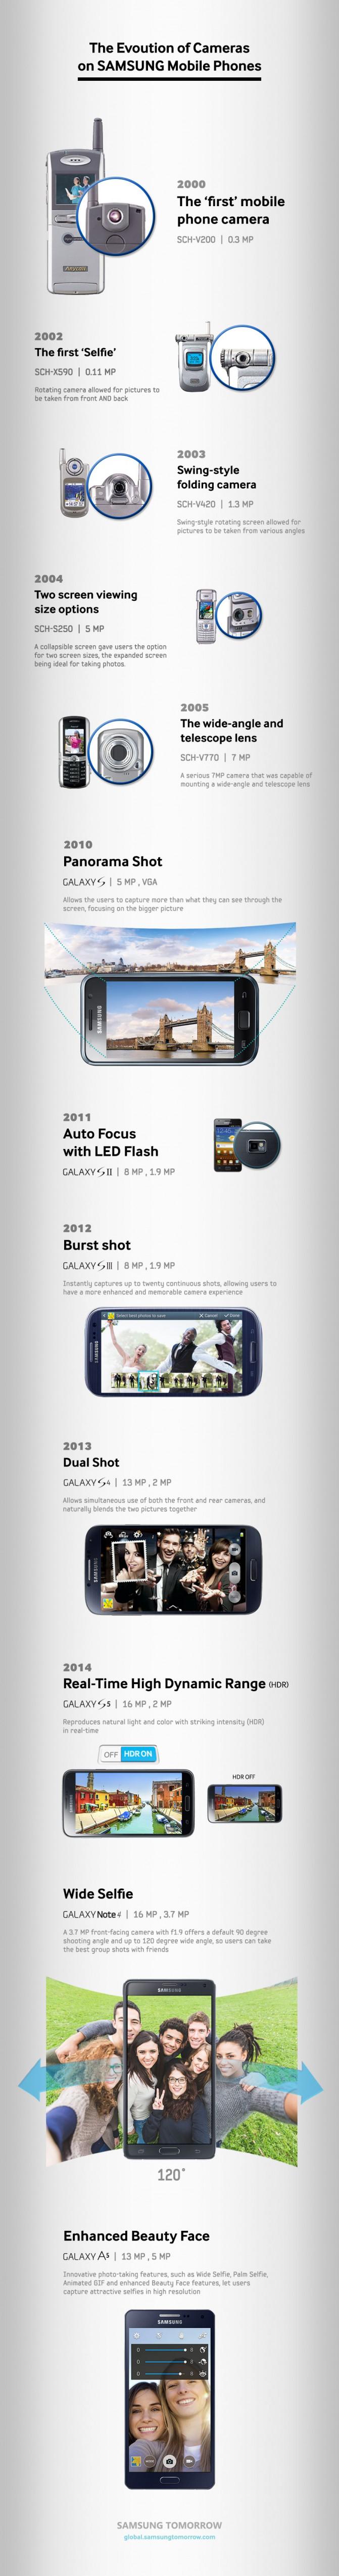 ST_SmartPhoneCameraHistory_Final3.0